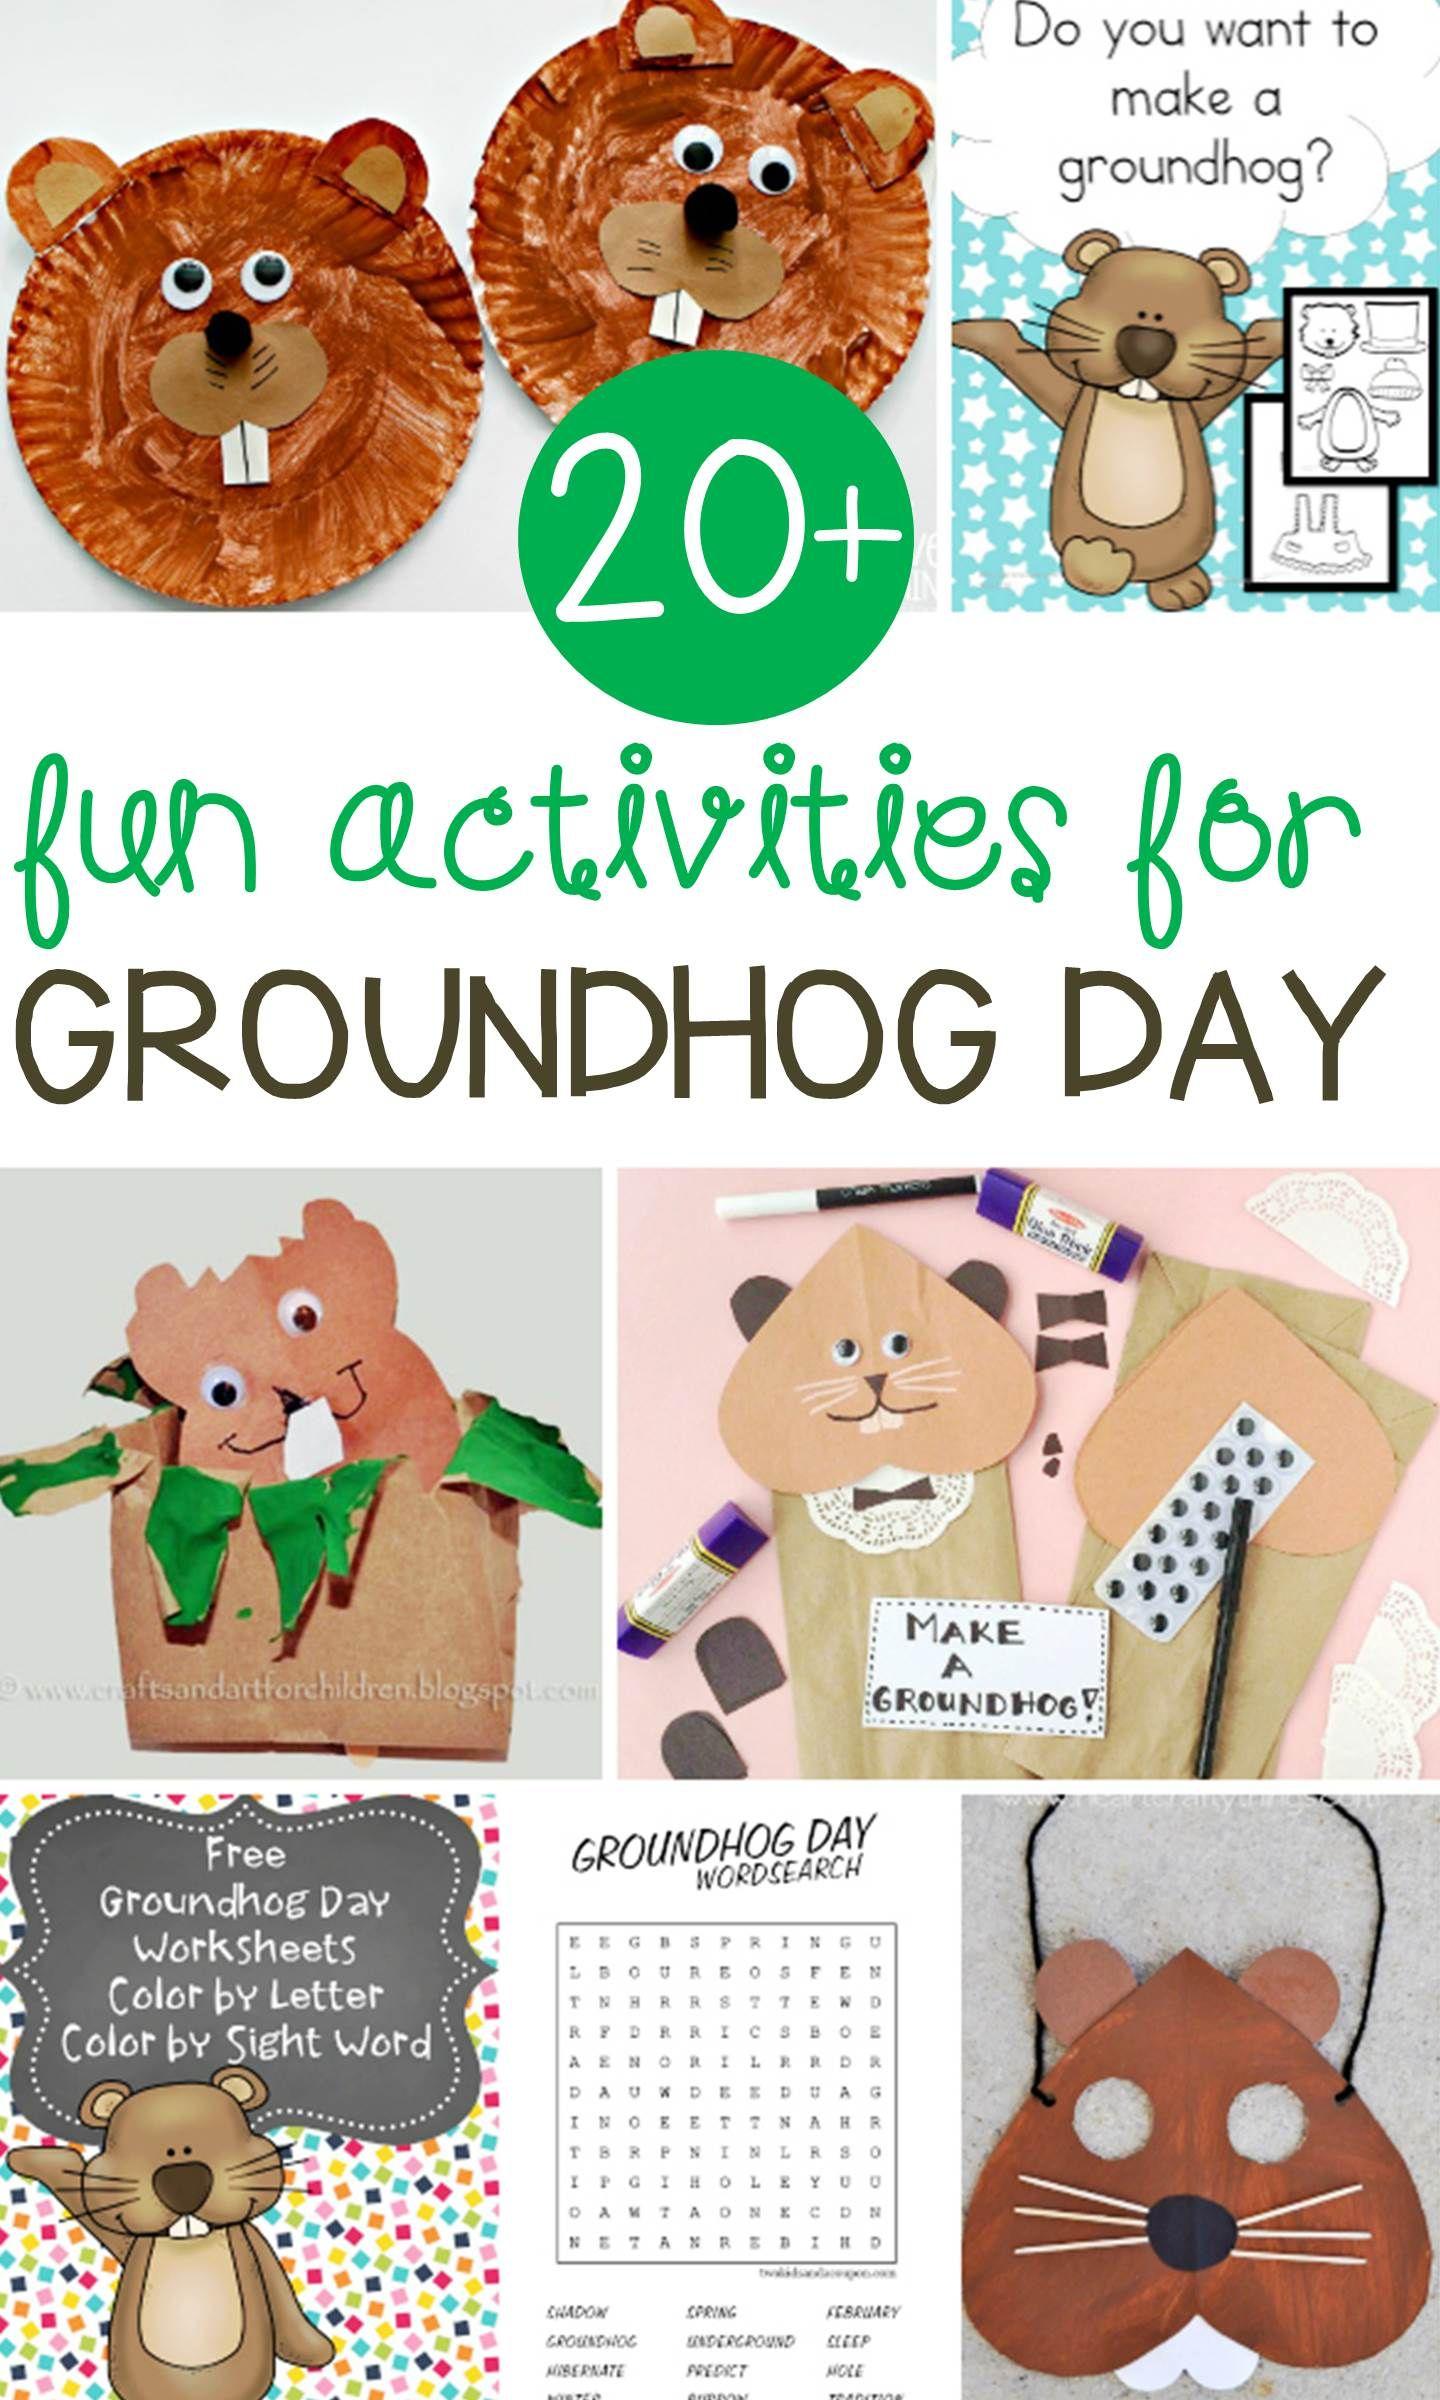 Fun Groundhog Day Activities For Kids